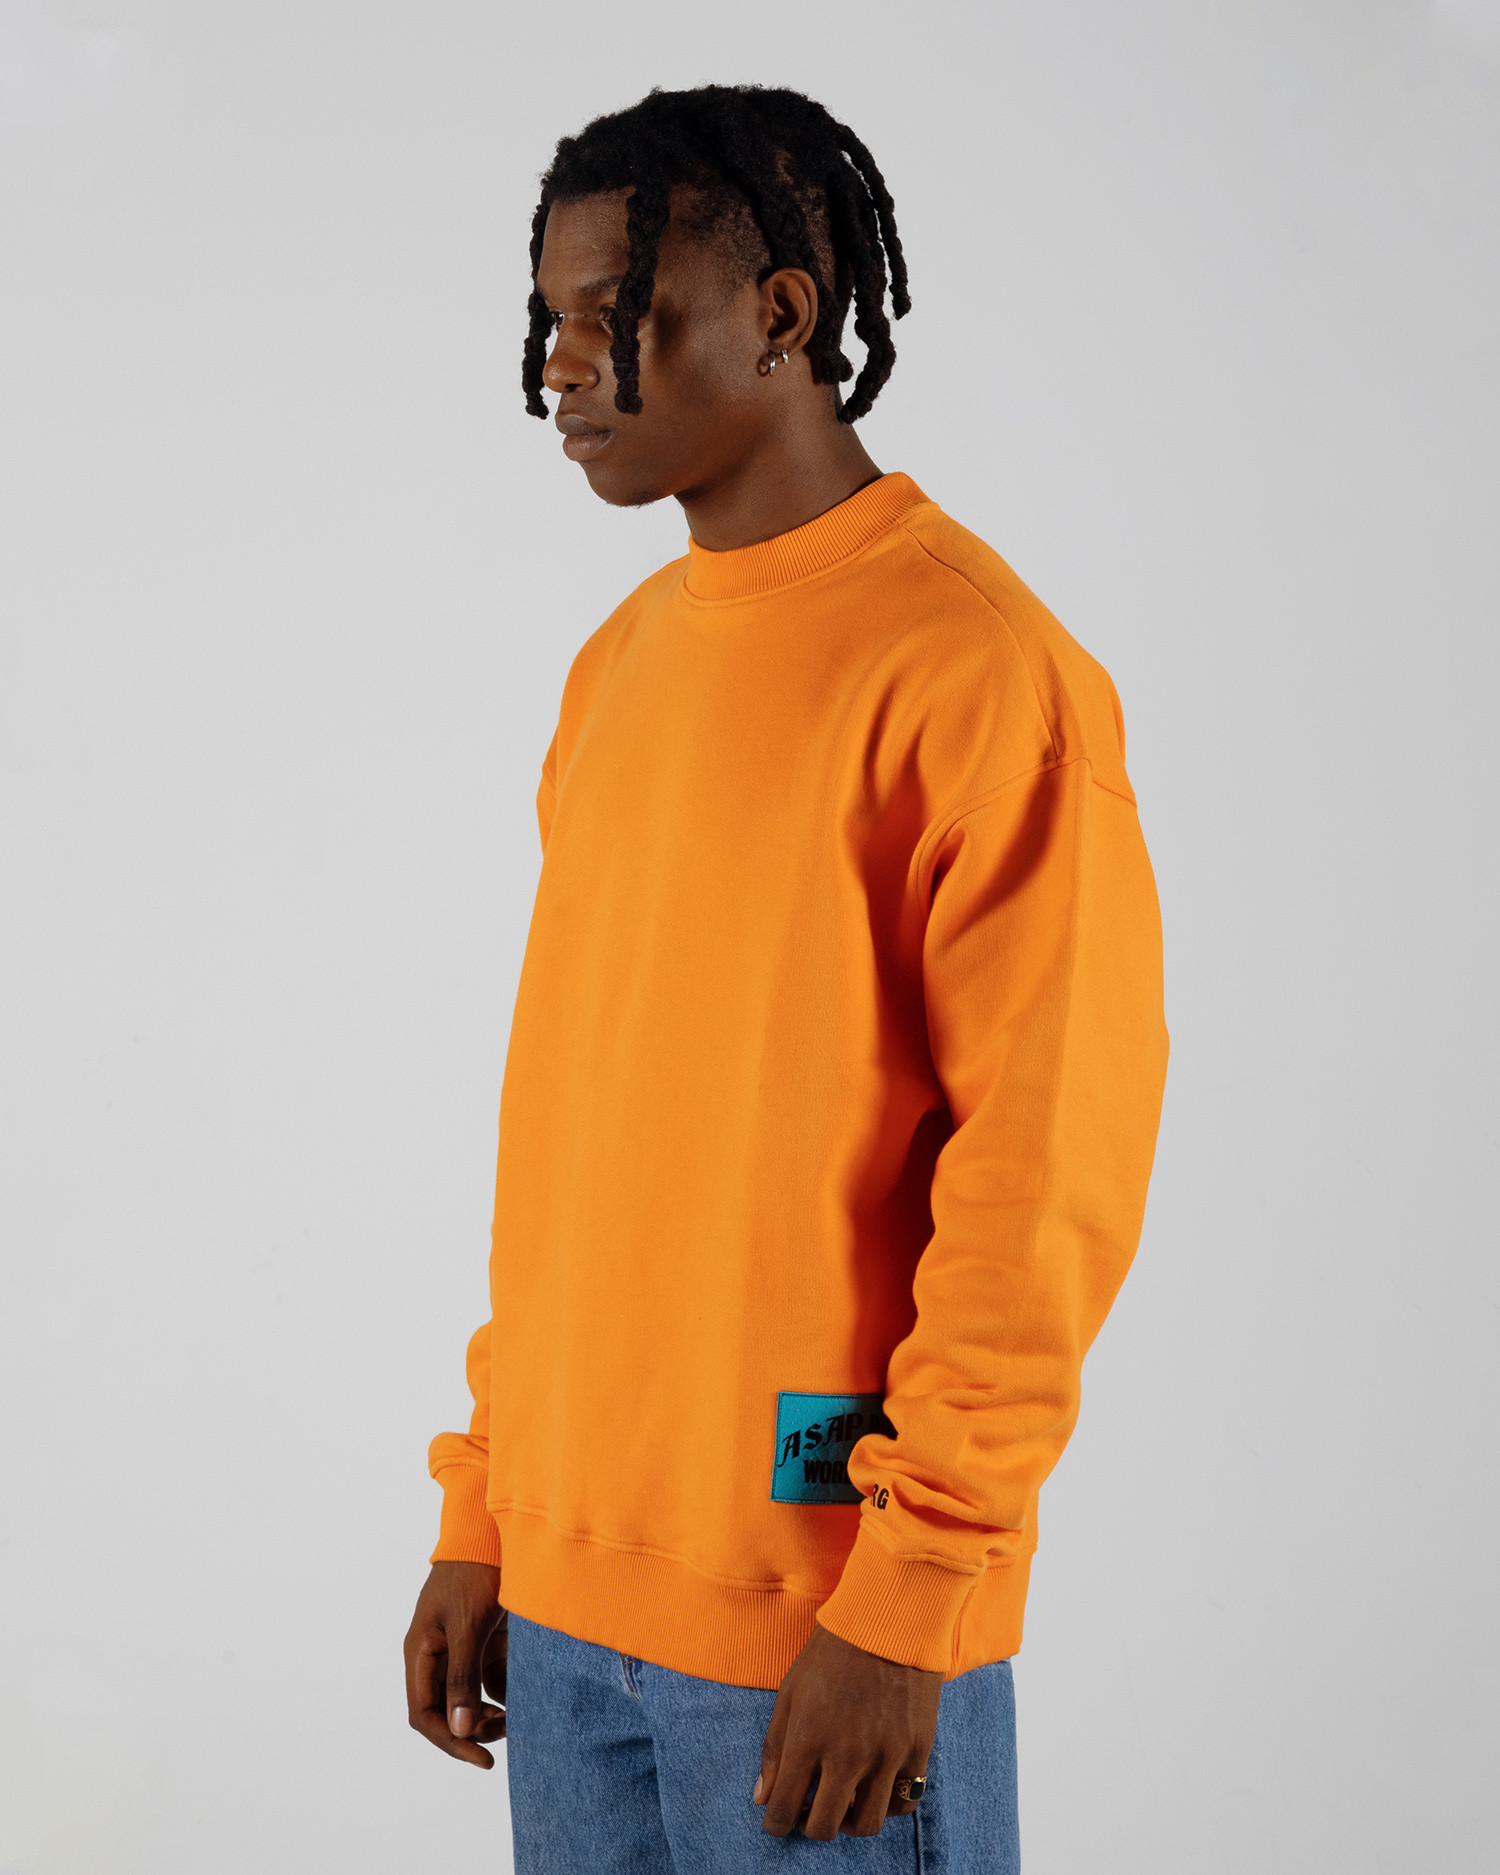 ASAP Ferg Hamilton Heights Crewneck Orange